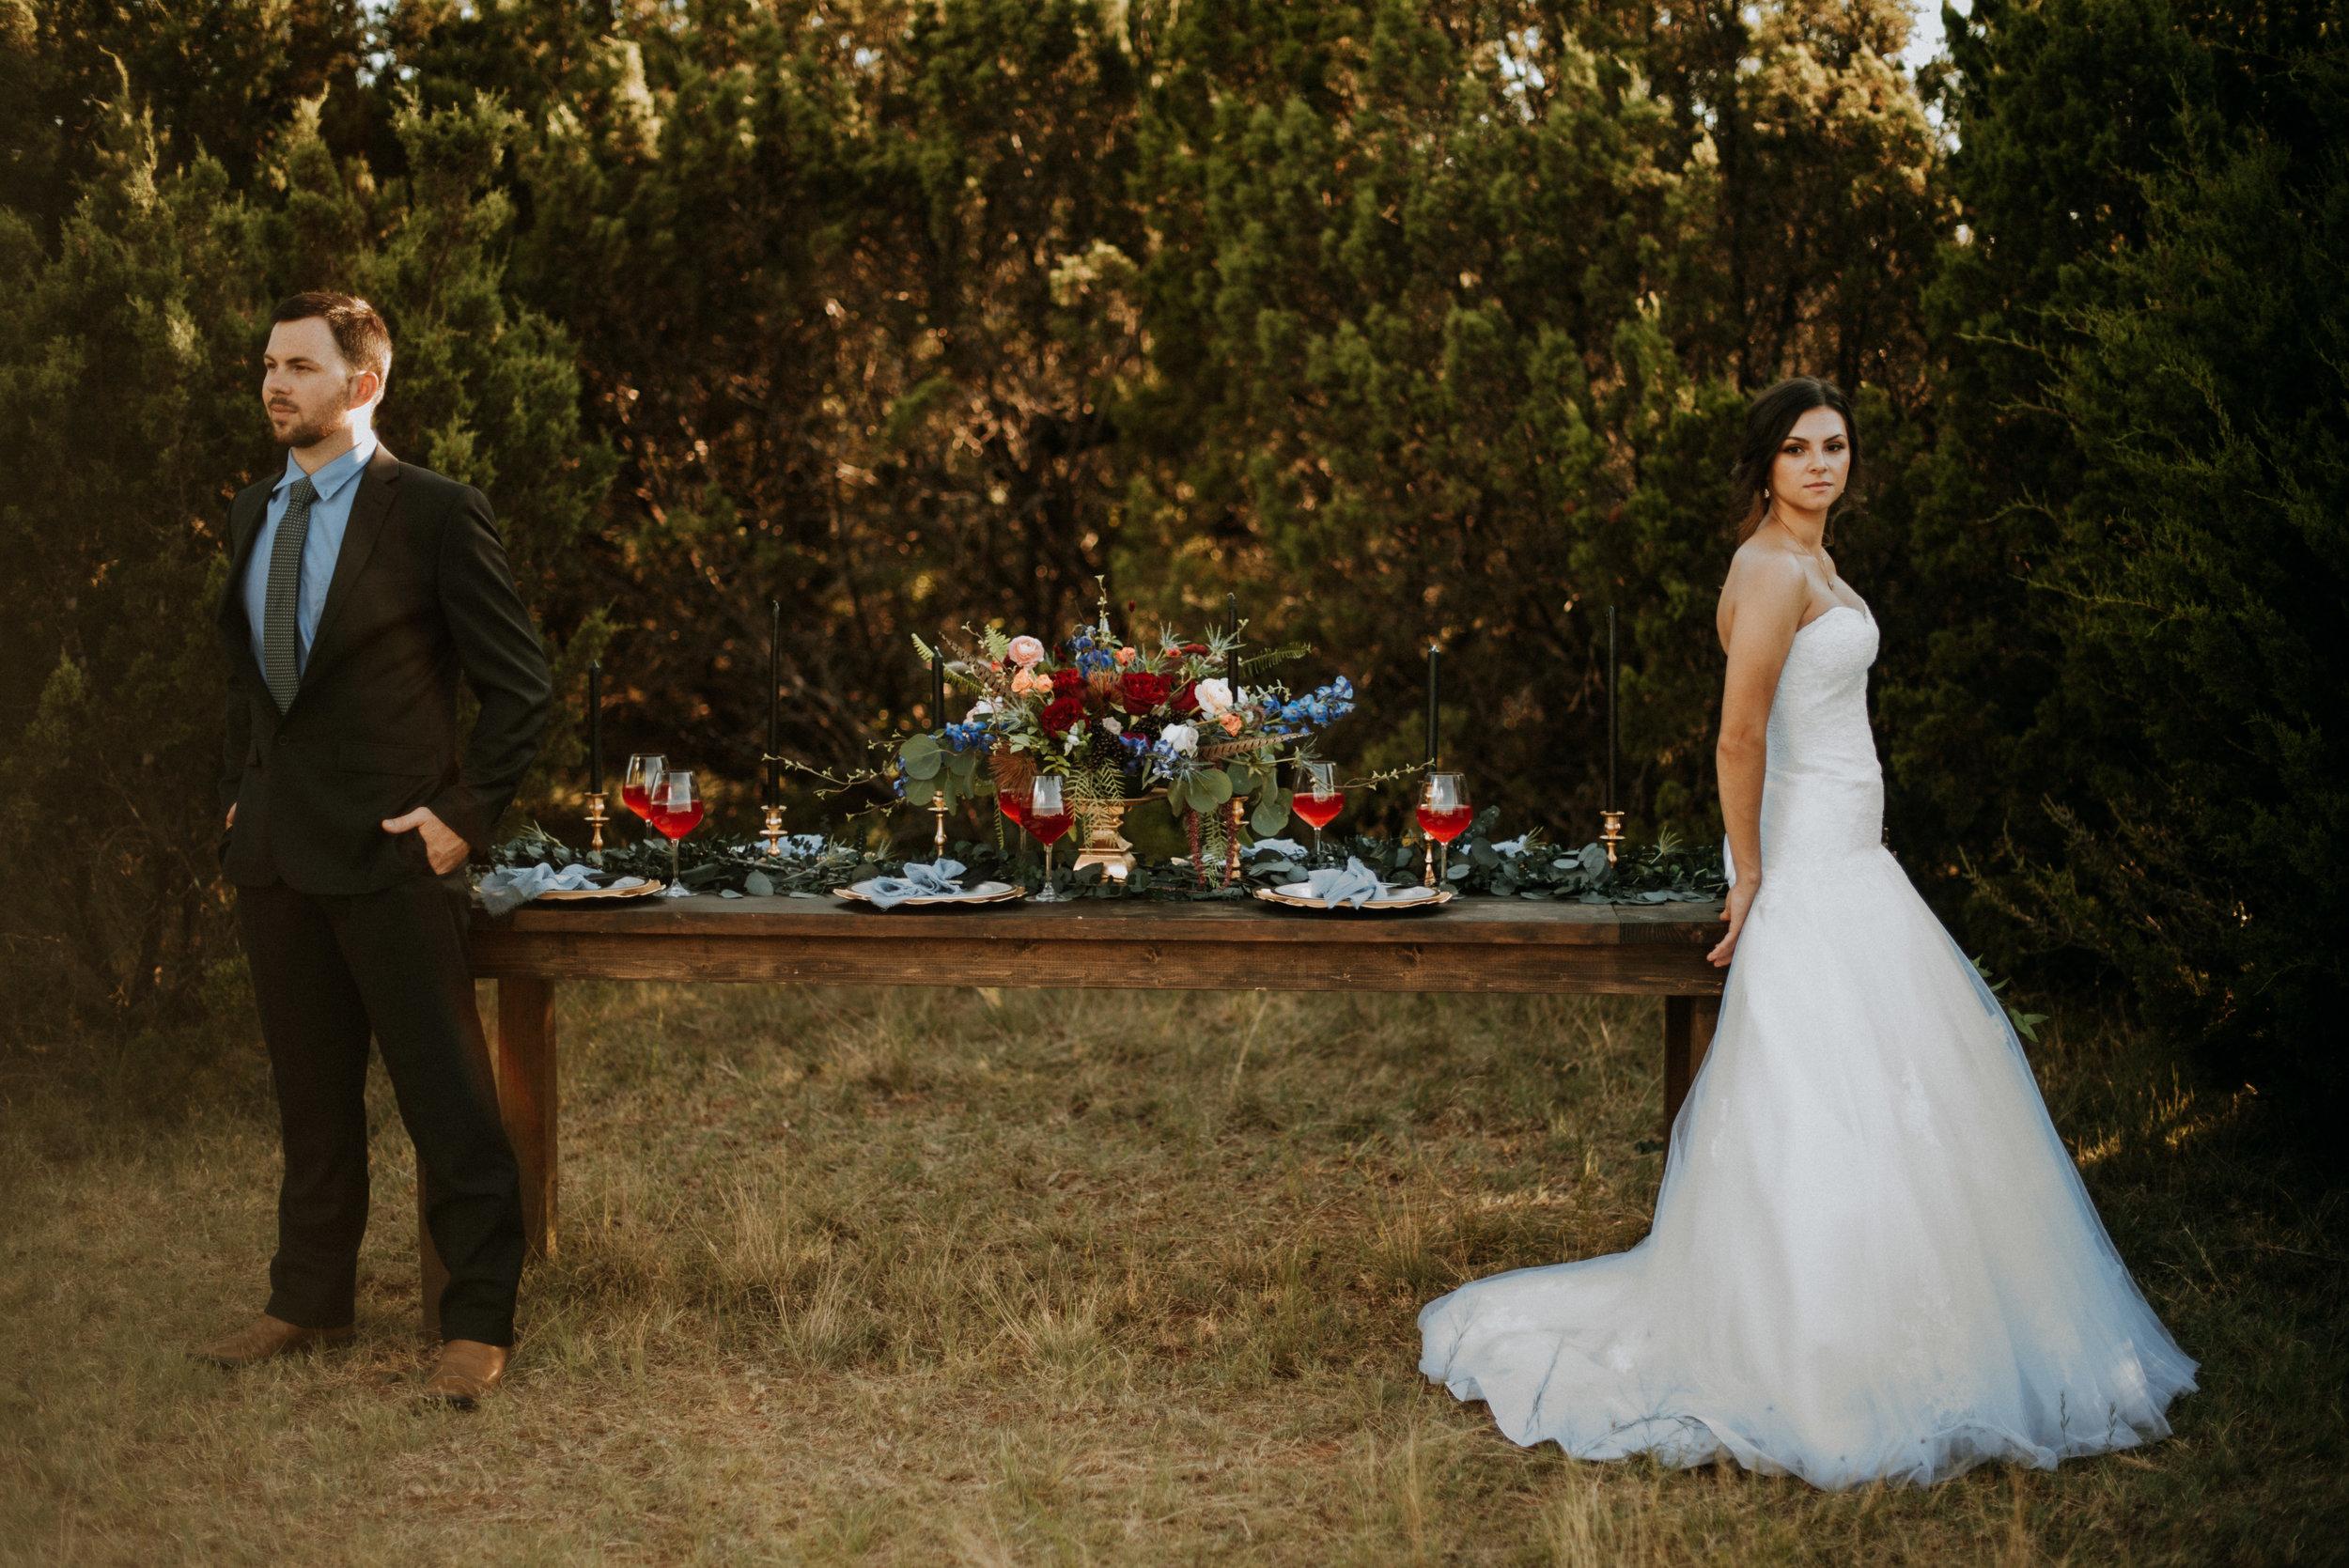 weddingworkshop_DSC1738.jpg